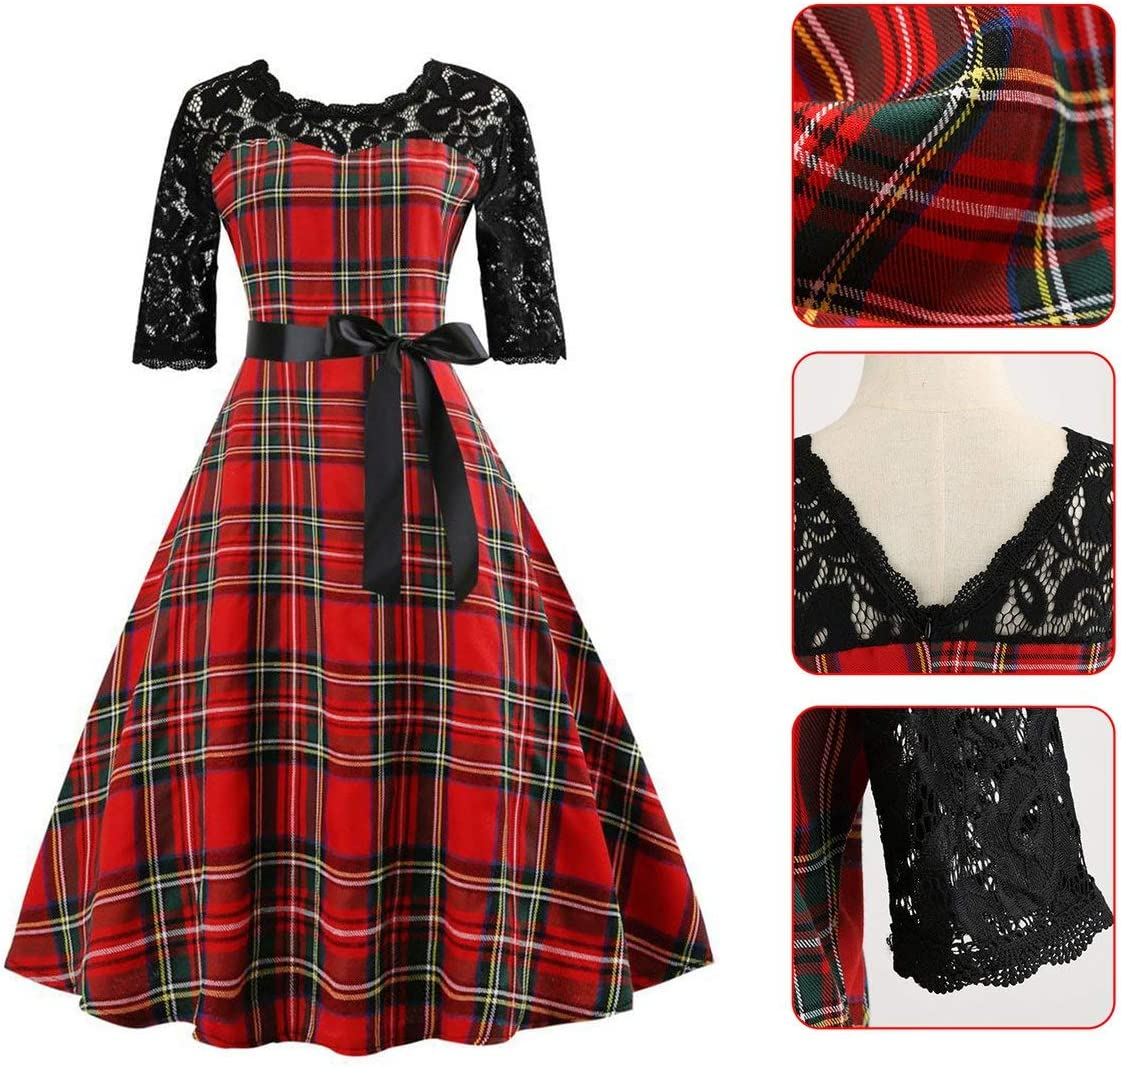 Fashion Womens Casual Dress Retro Lace Plaid Stitching Dress